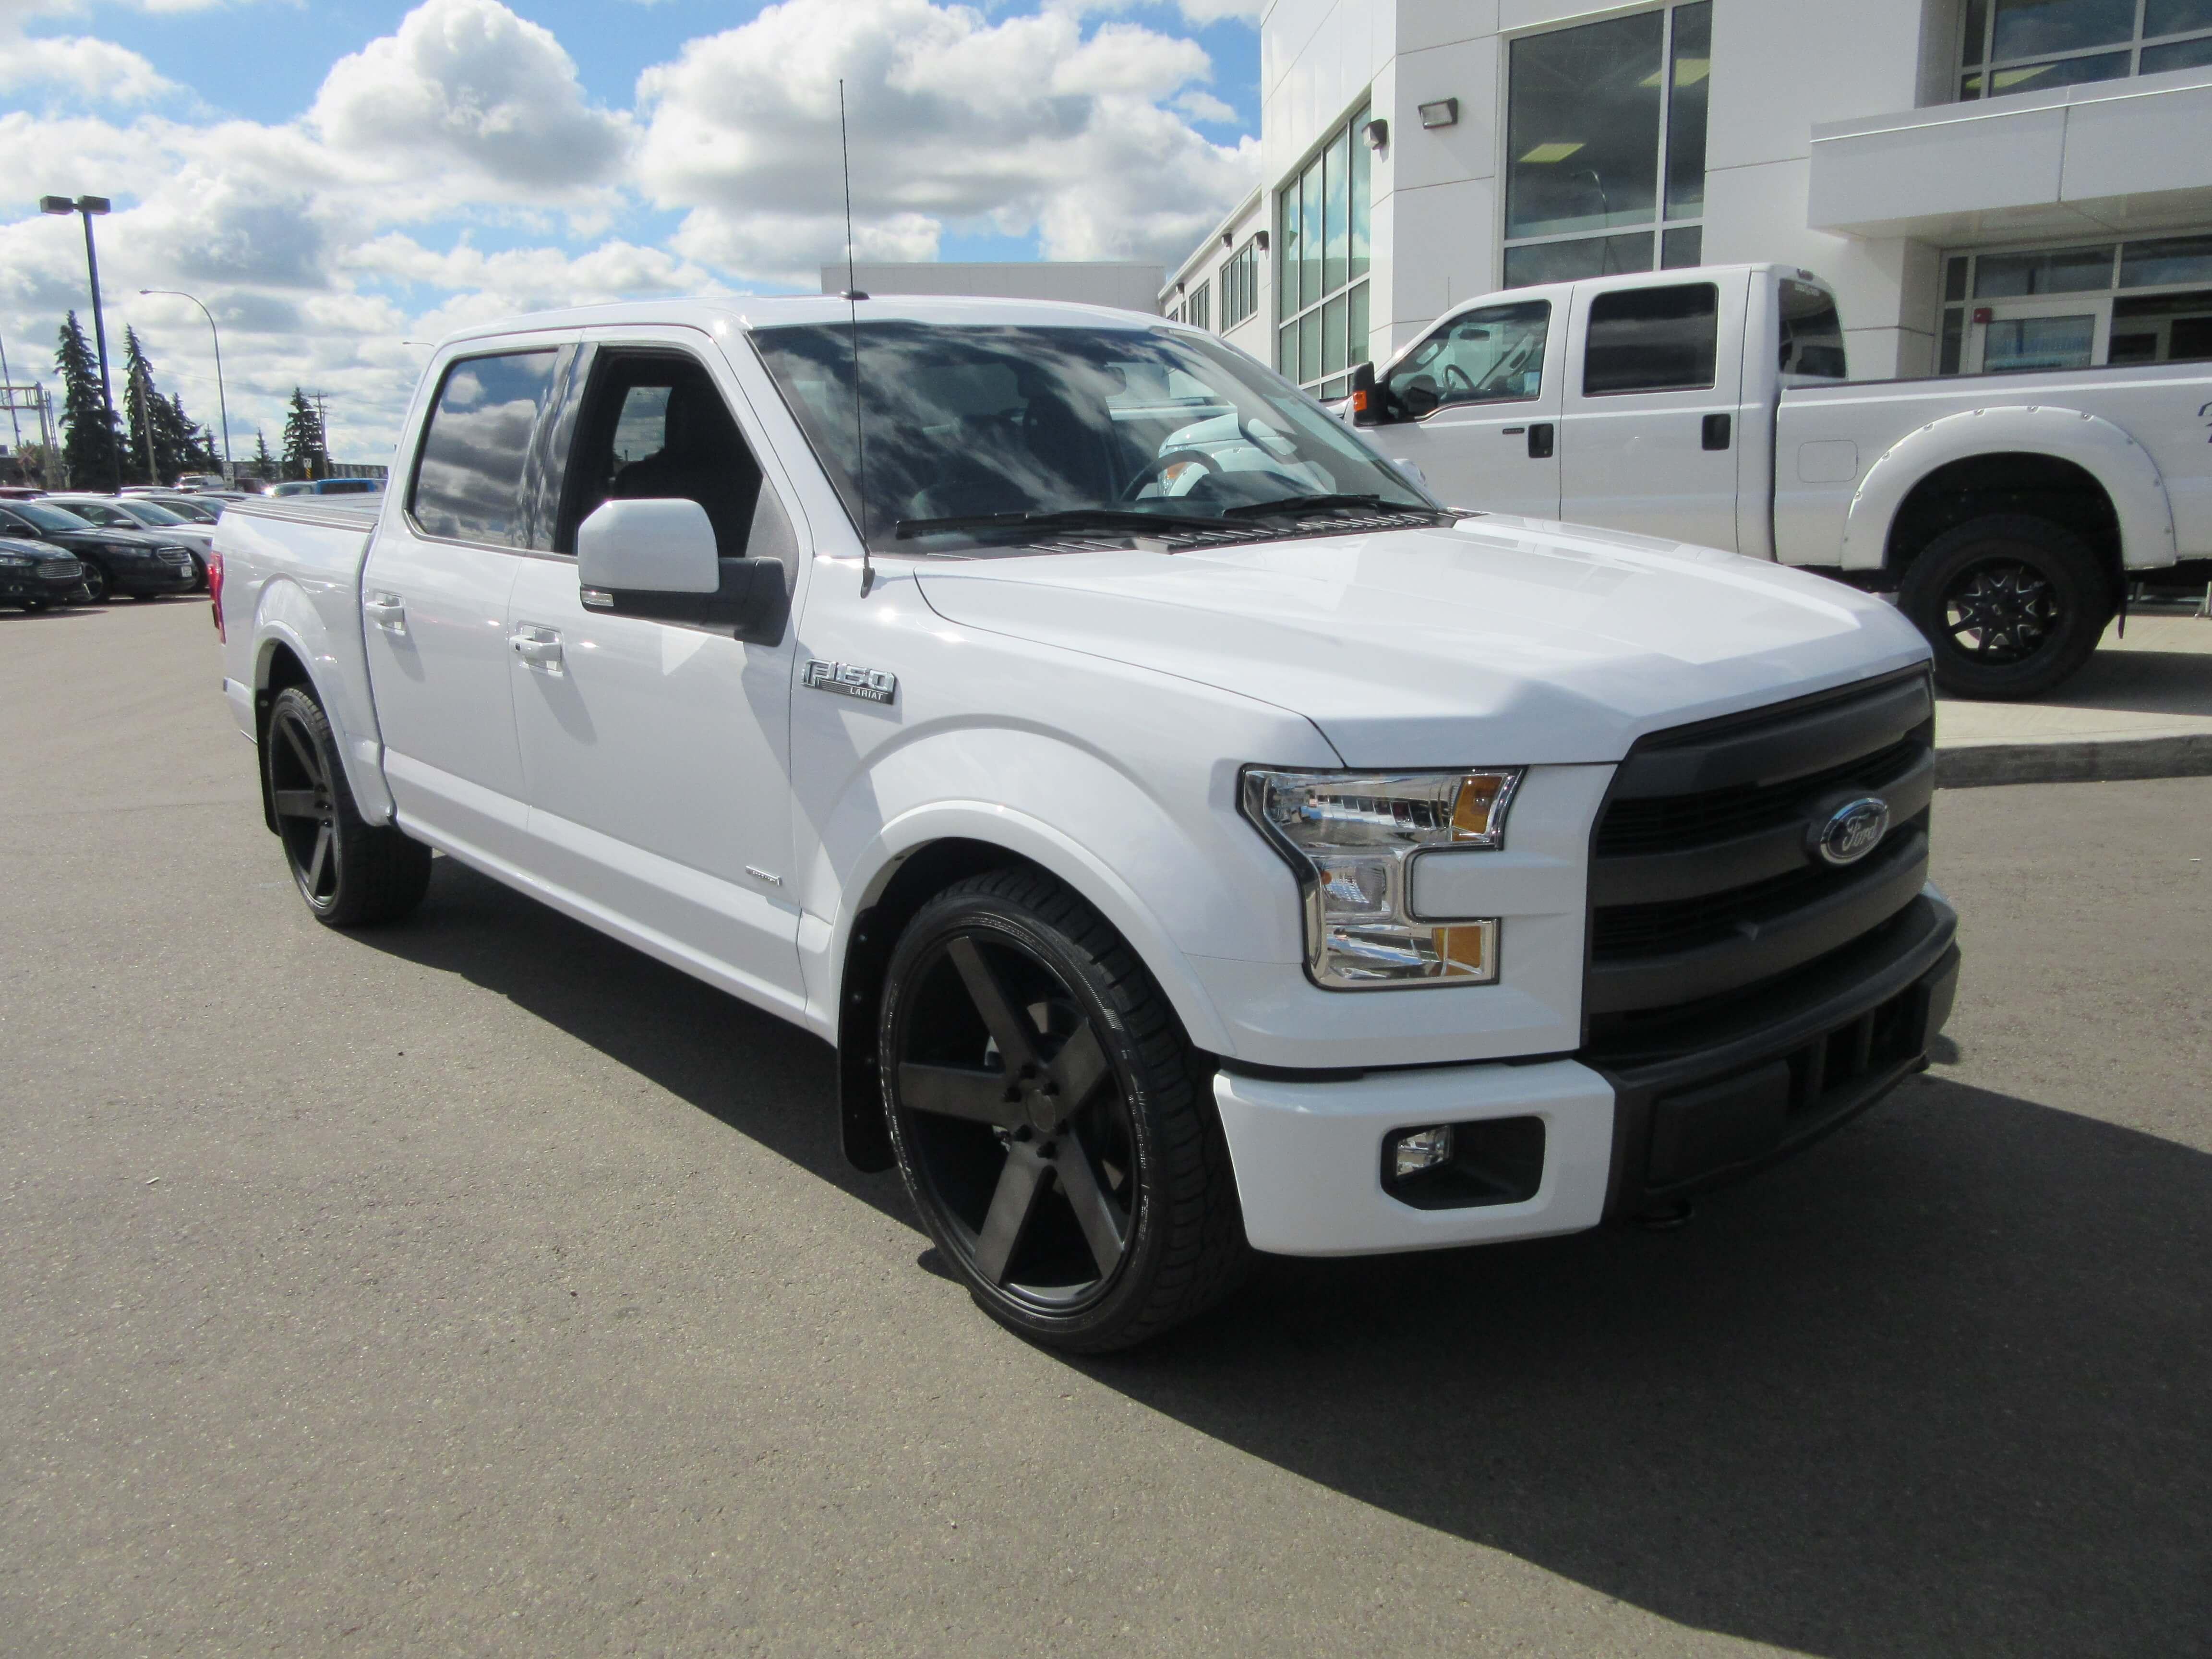 Custom Ford Trucks for sale in Edmonton, Spruce Grove, Alberta